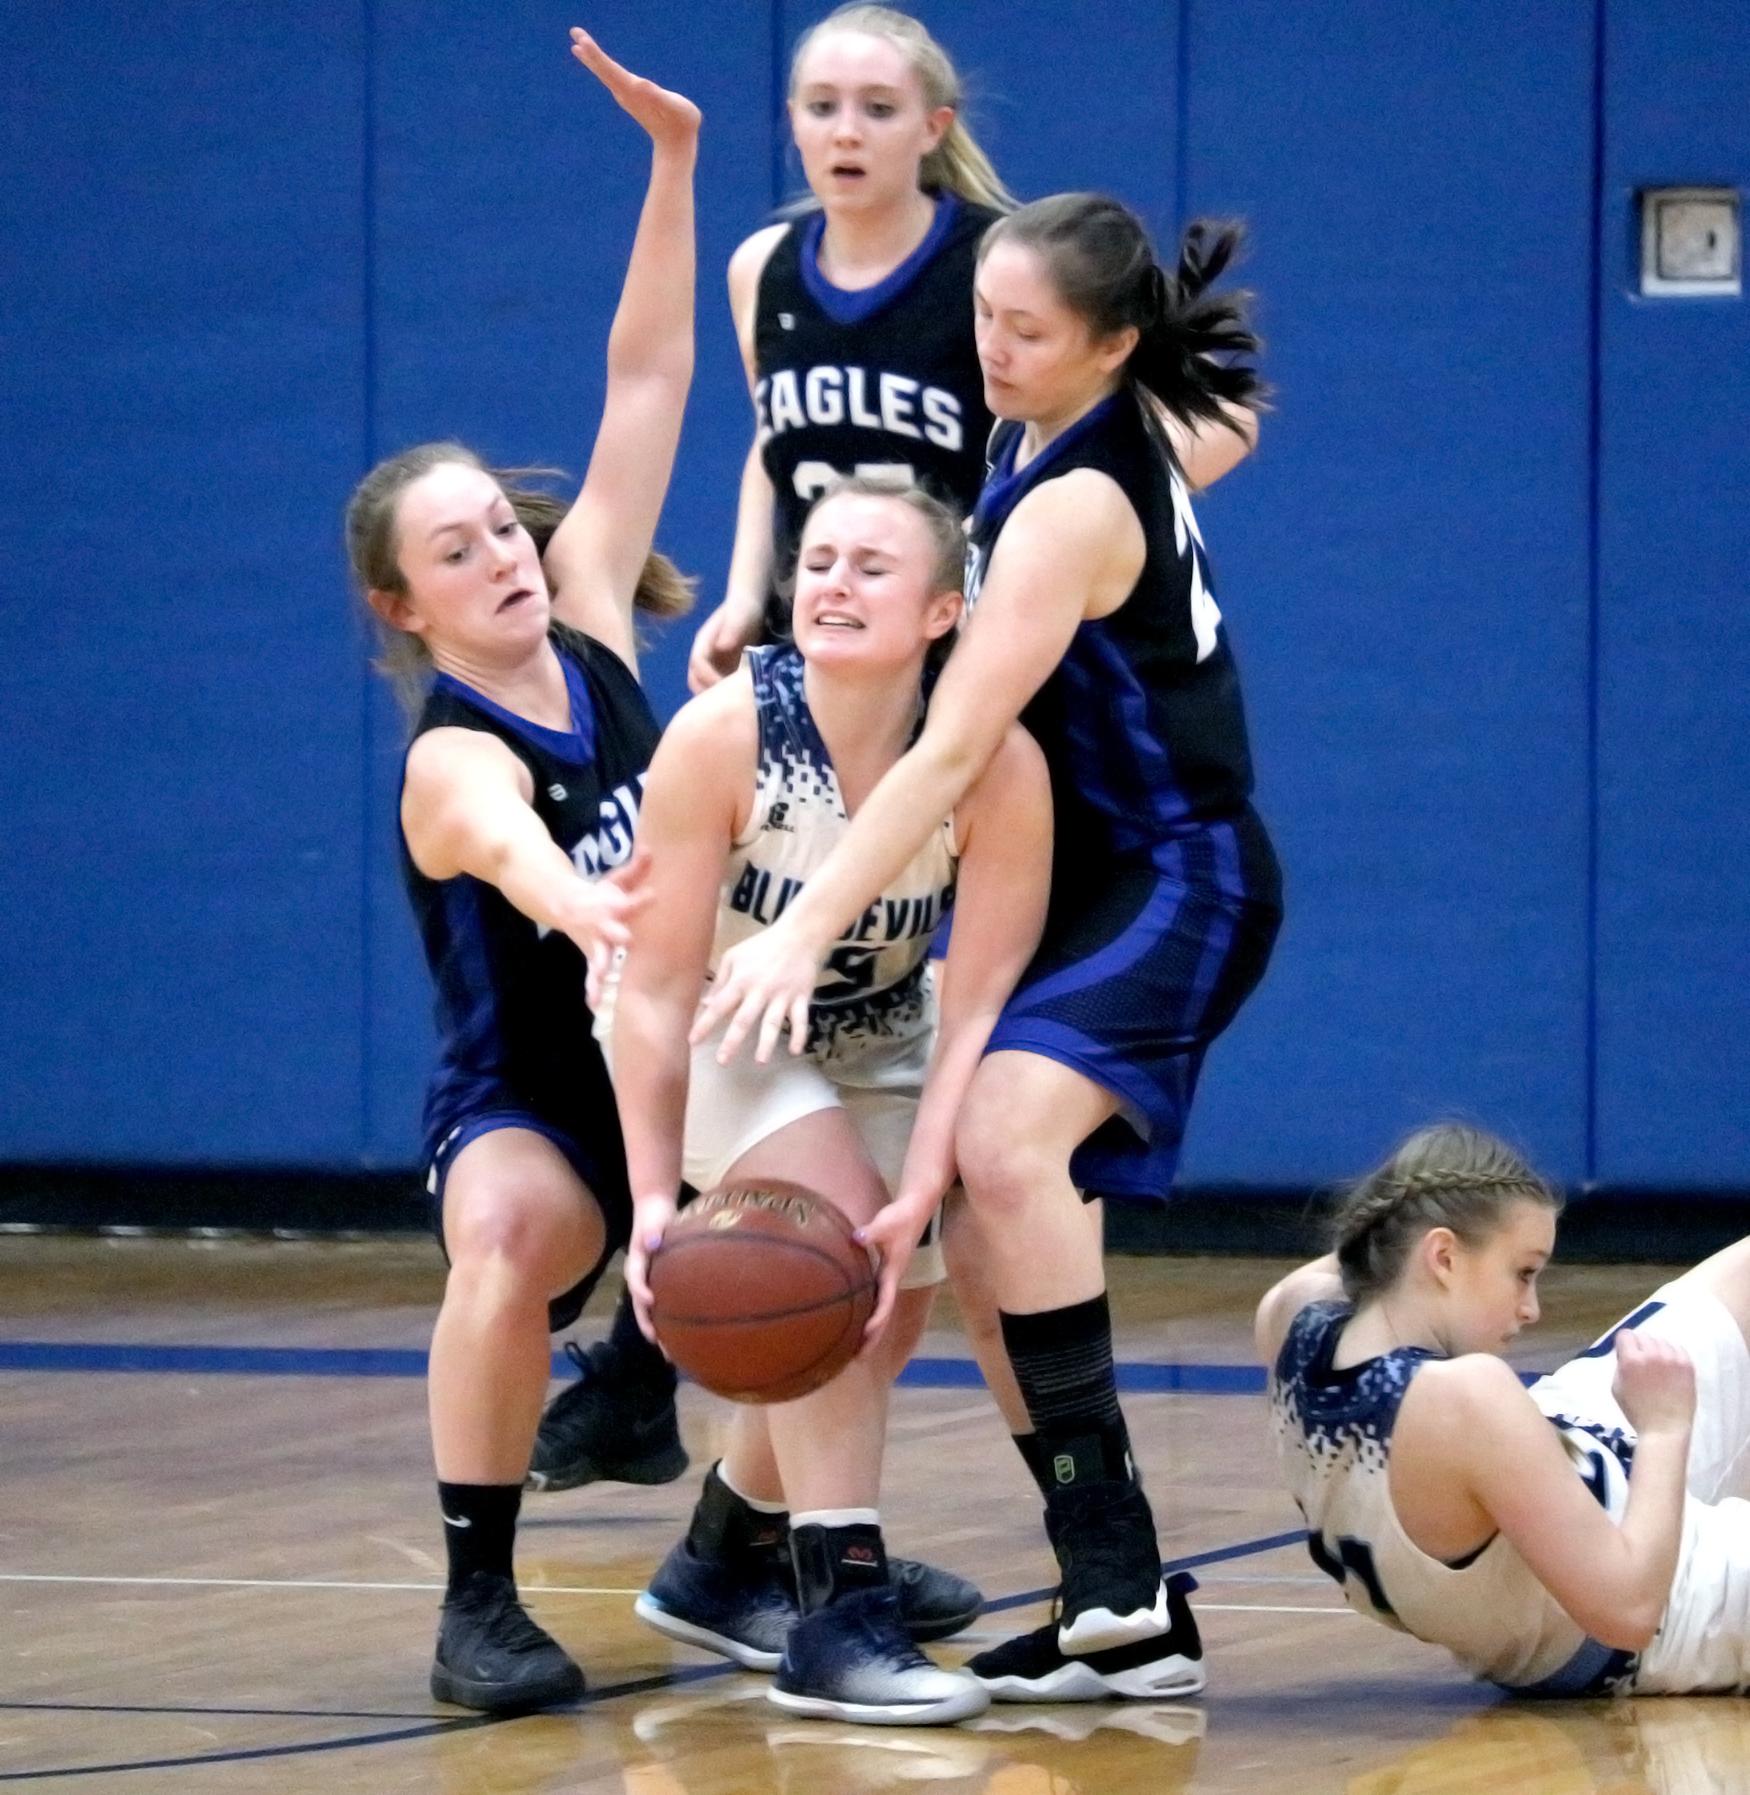 Girls basketball action (2/2021)